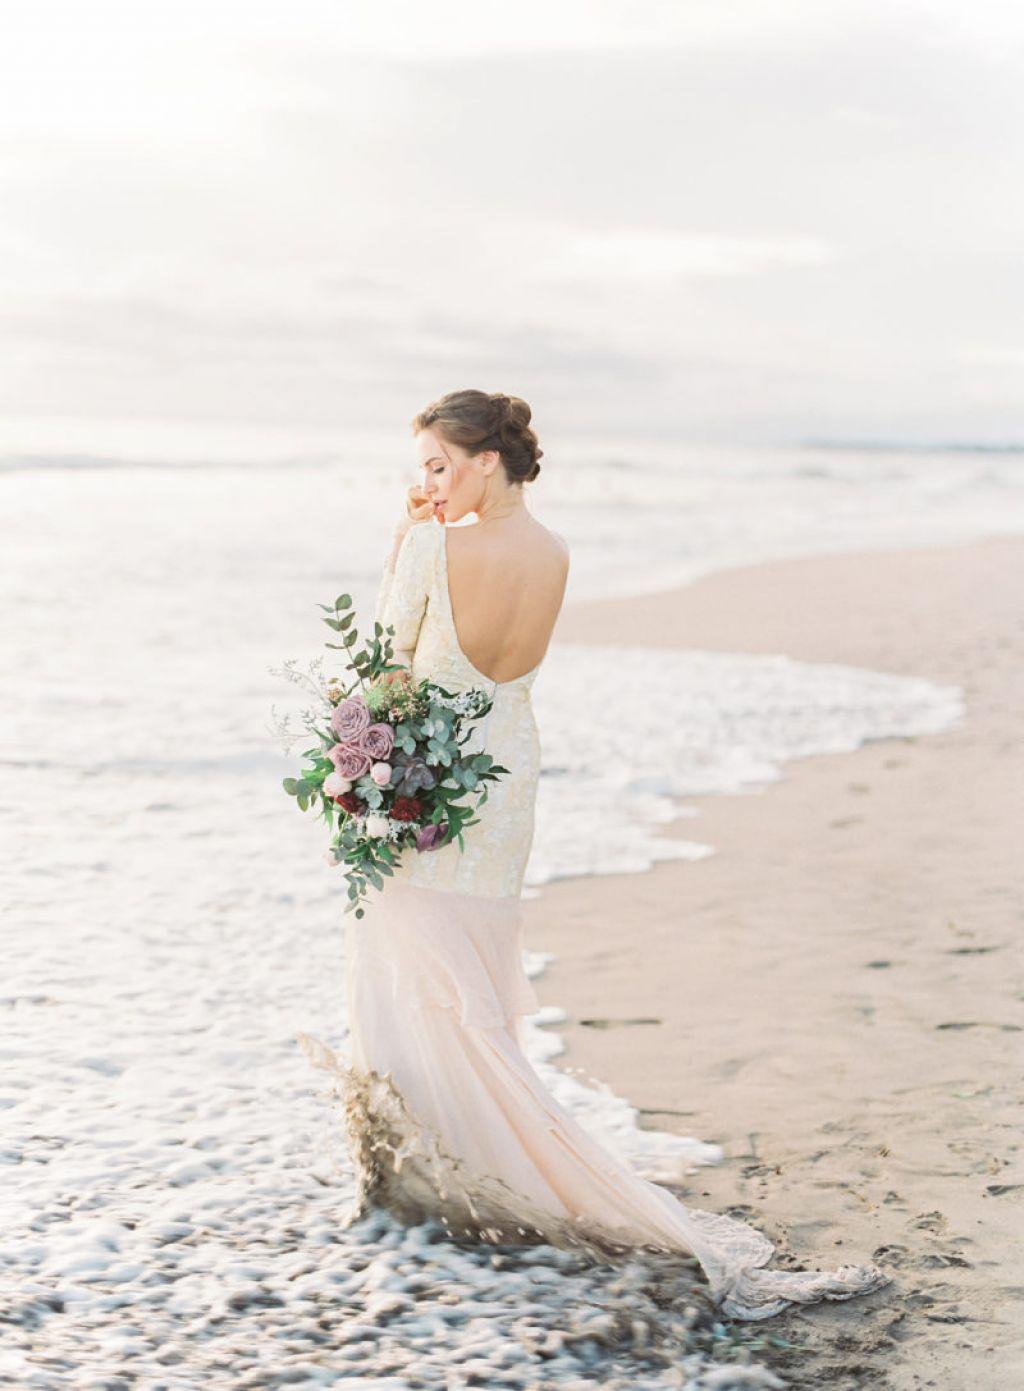 Beach Pre Wedding Photo Shoot Inspiration